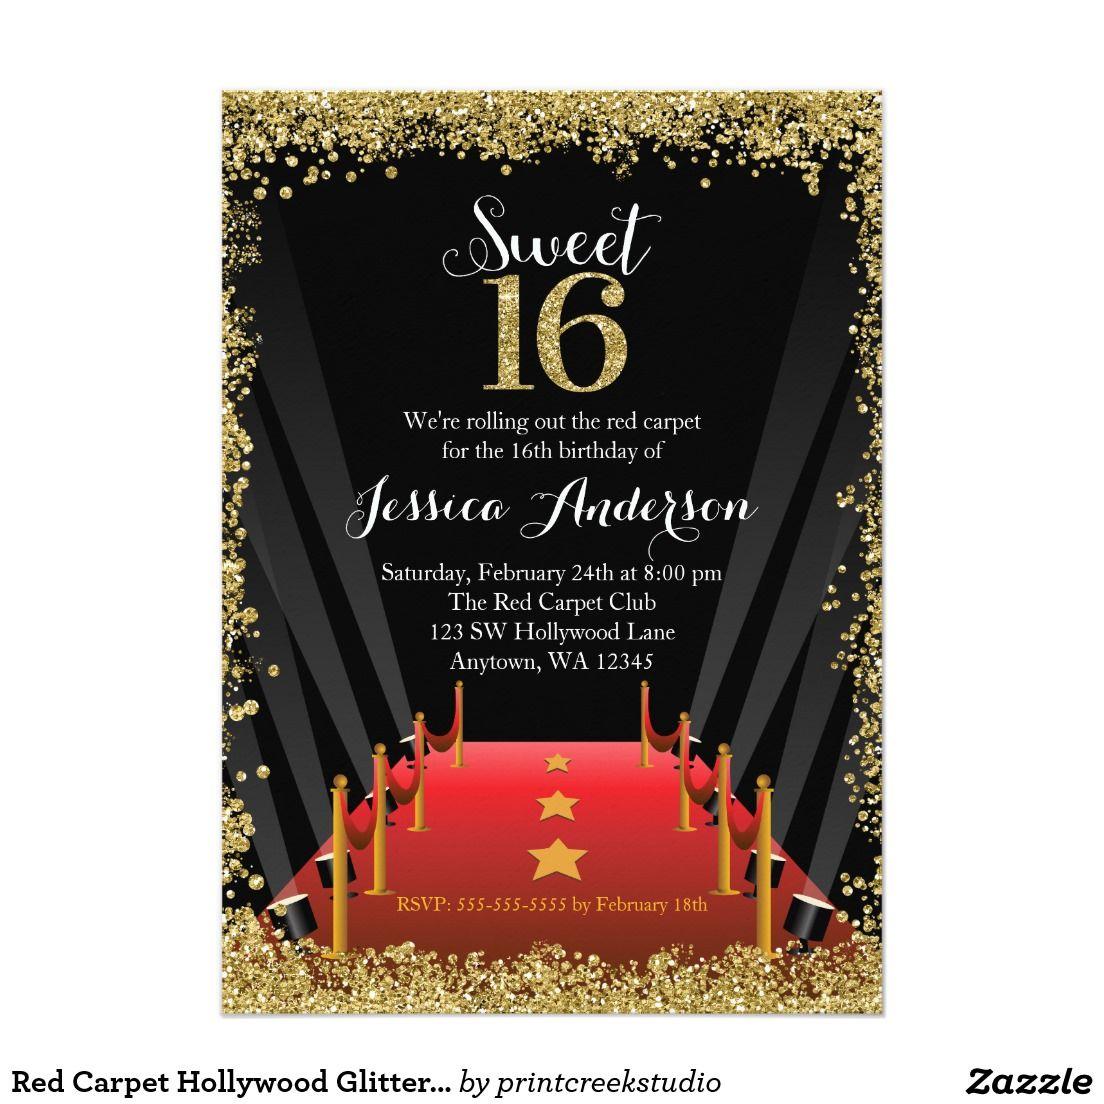 Red Carpet Hollywood Glitter Sweet 16 Birthday Card | Sweet 16 ...